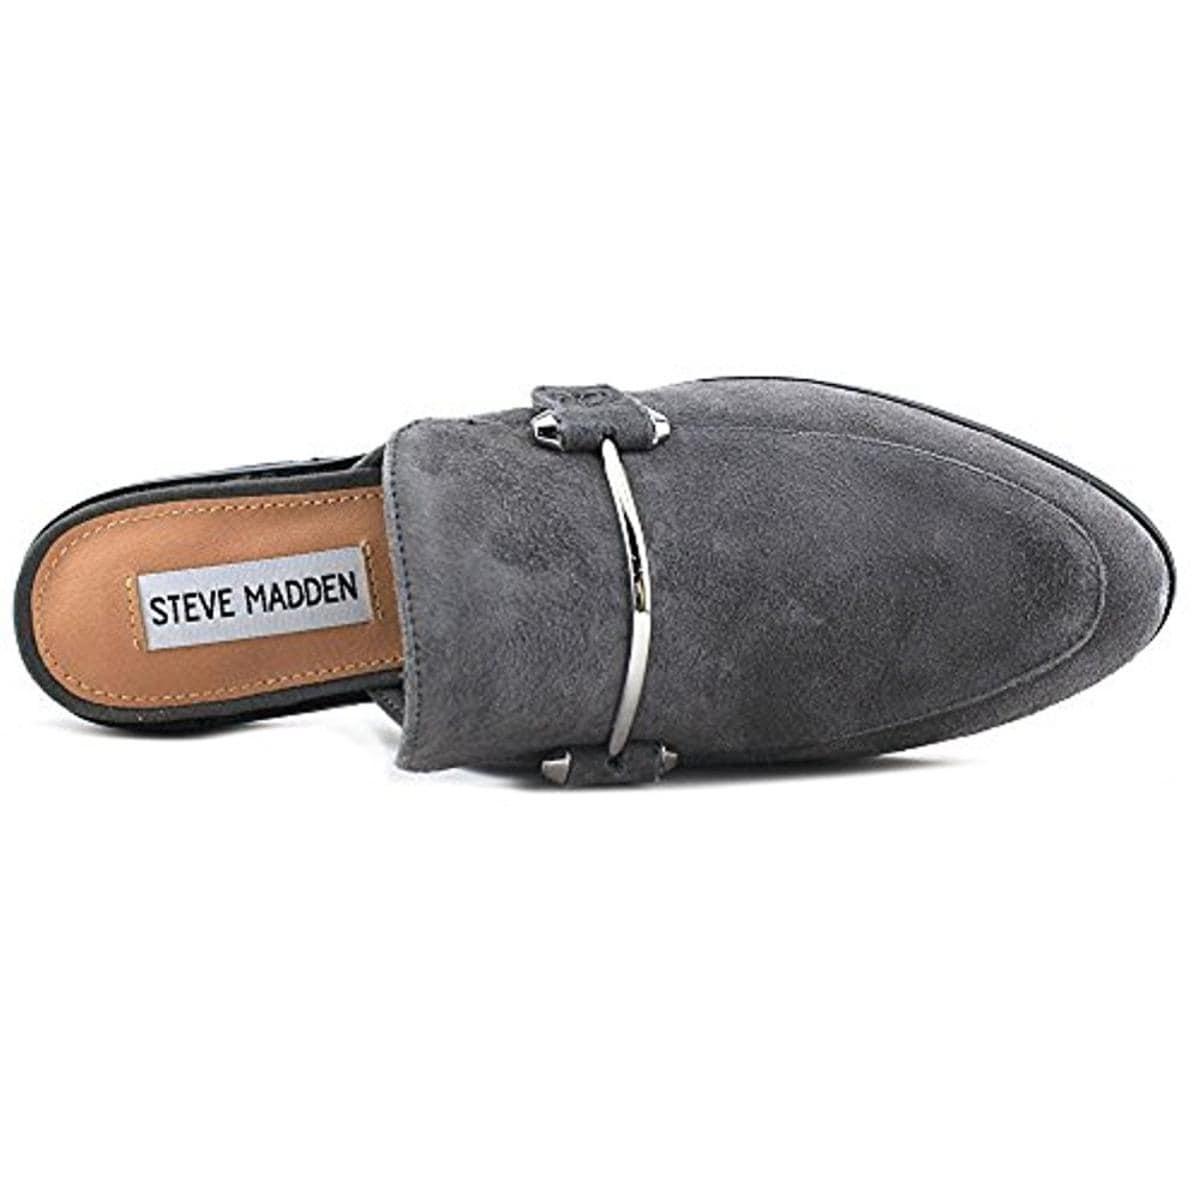 a0d34ae4d09 Steve Madden Womens Laaura Mules Embellished Almond Toe